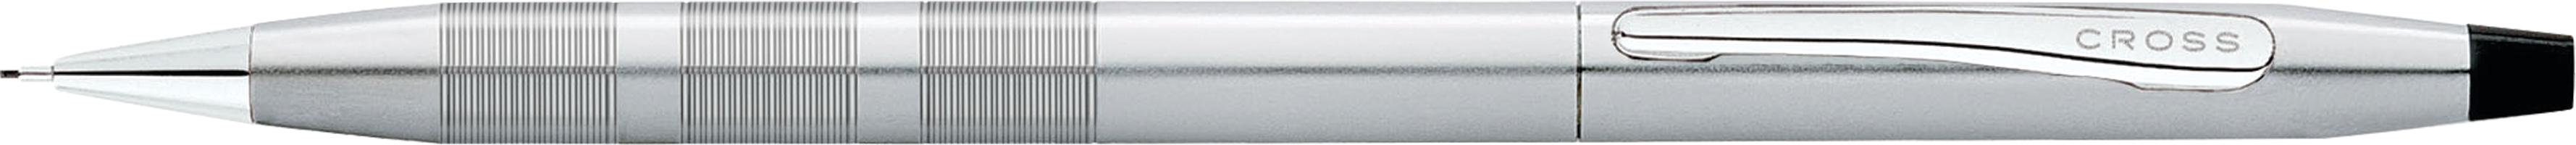 Century Brushed Chrome PCL